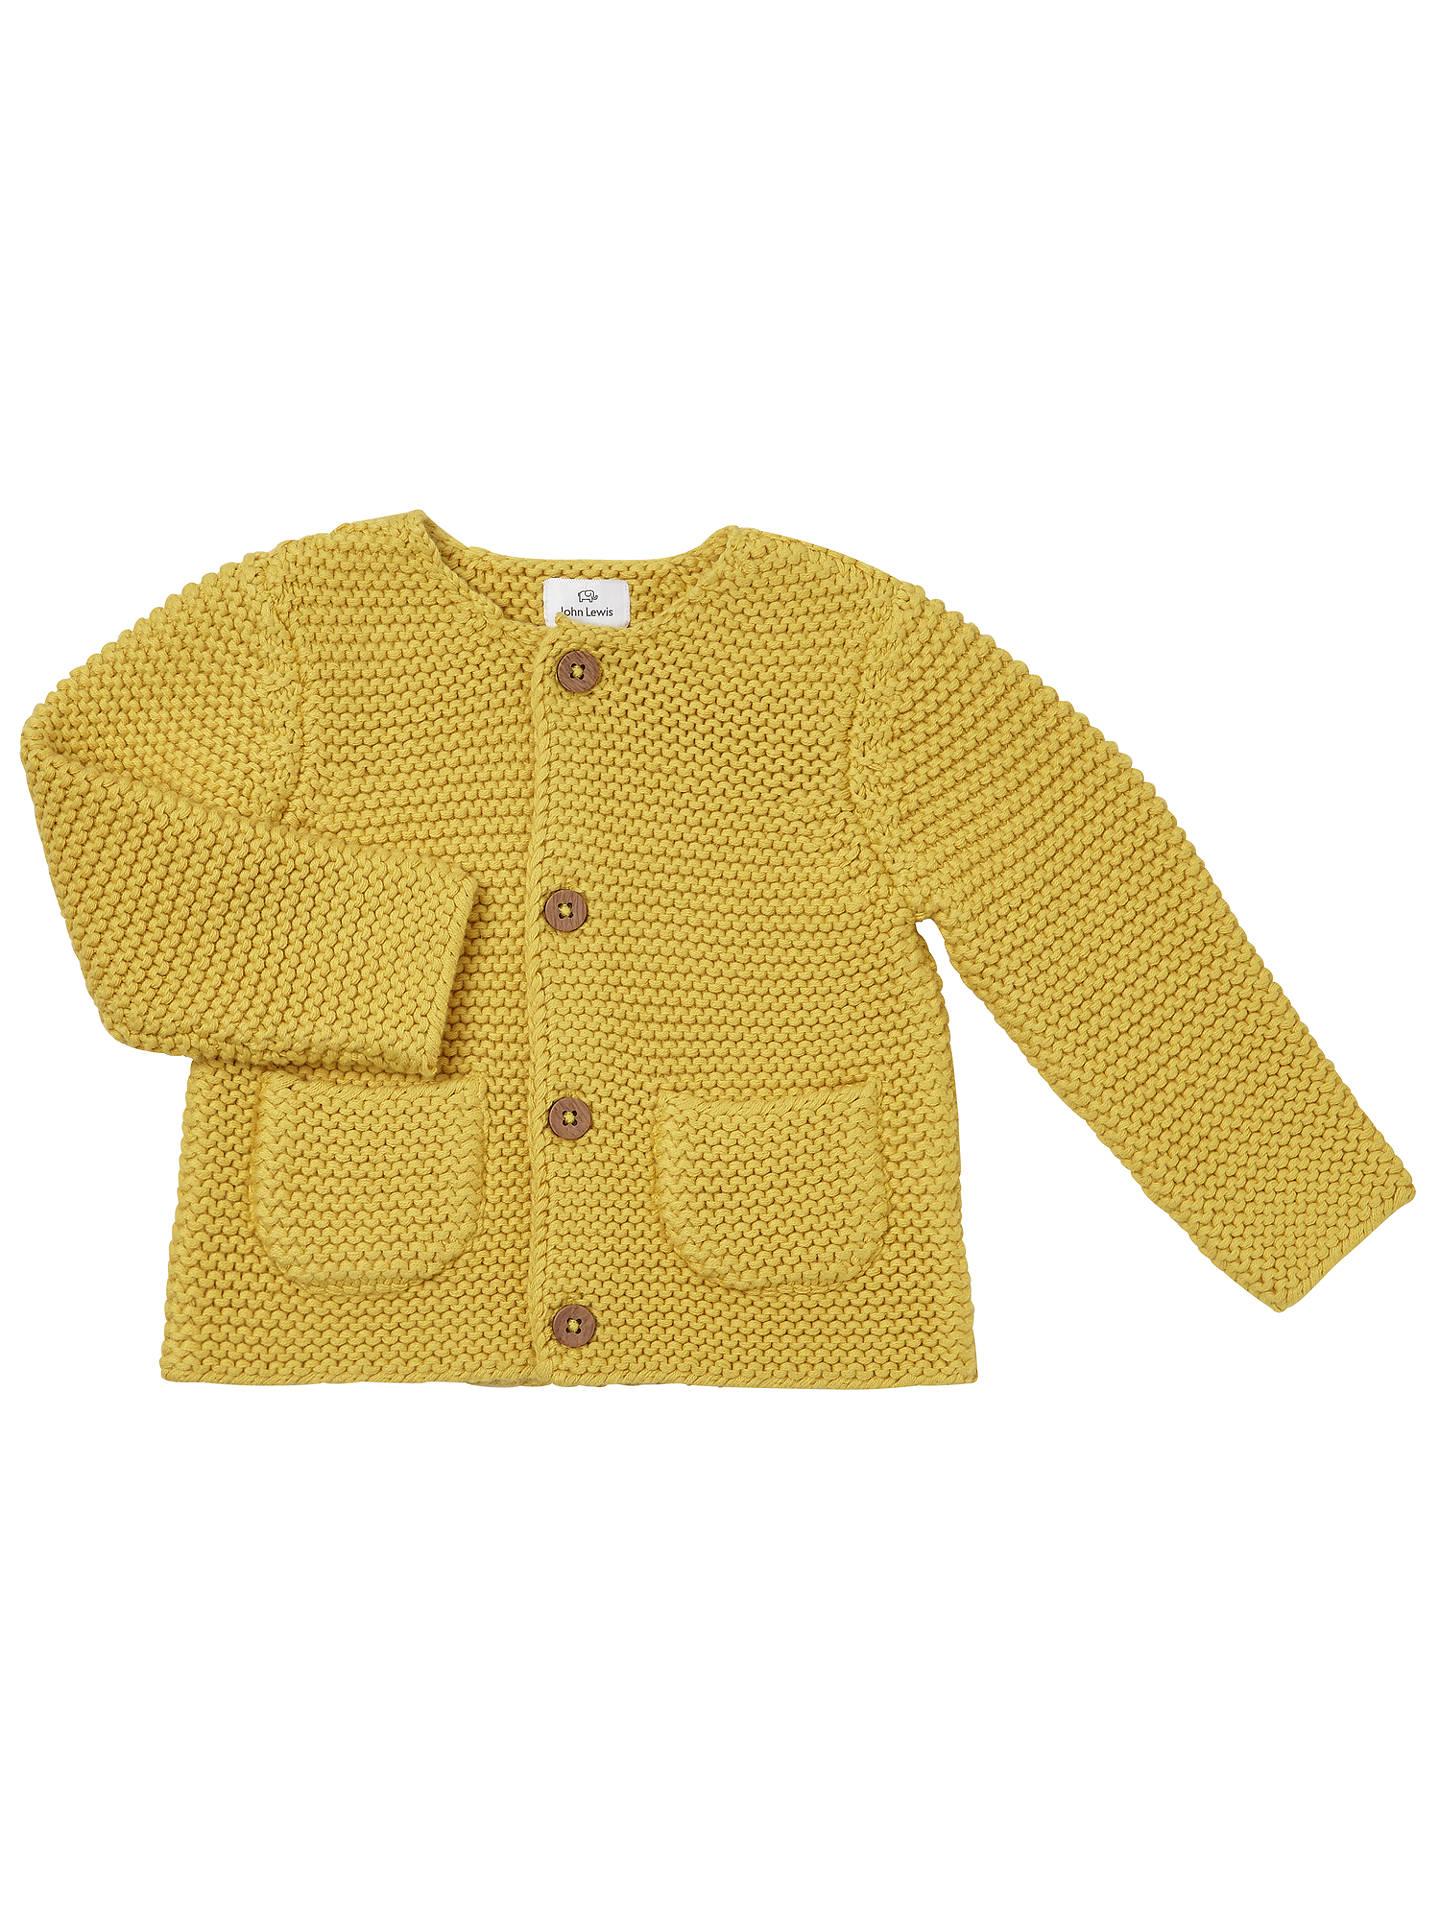 82f63084a John Lewis Baby Chunky Knit Cardigan